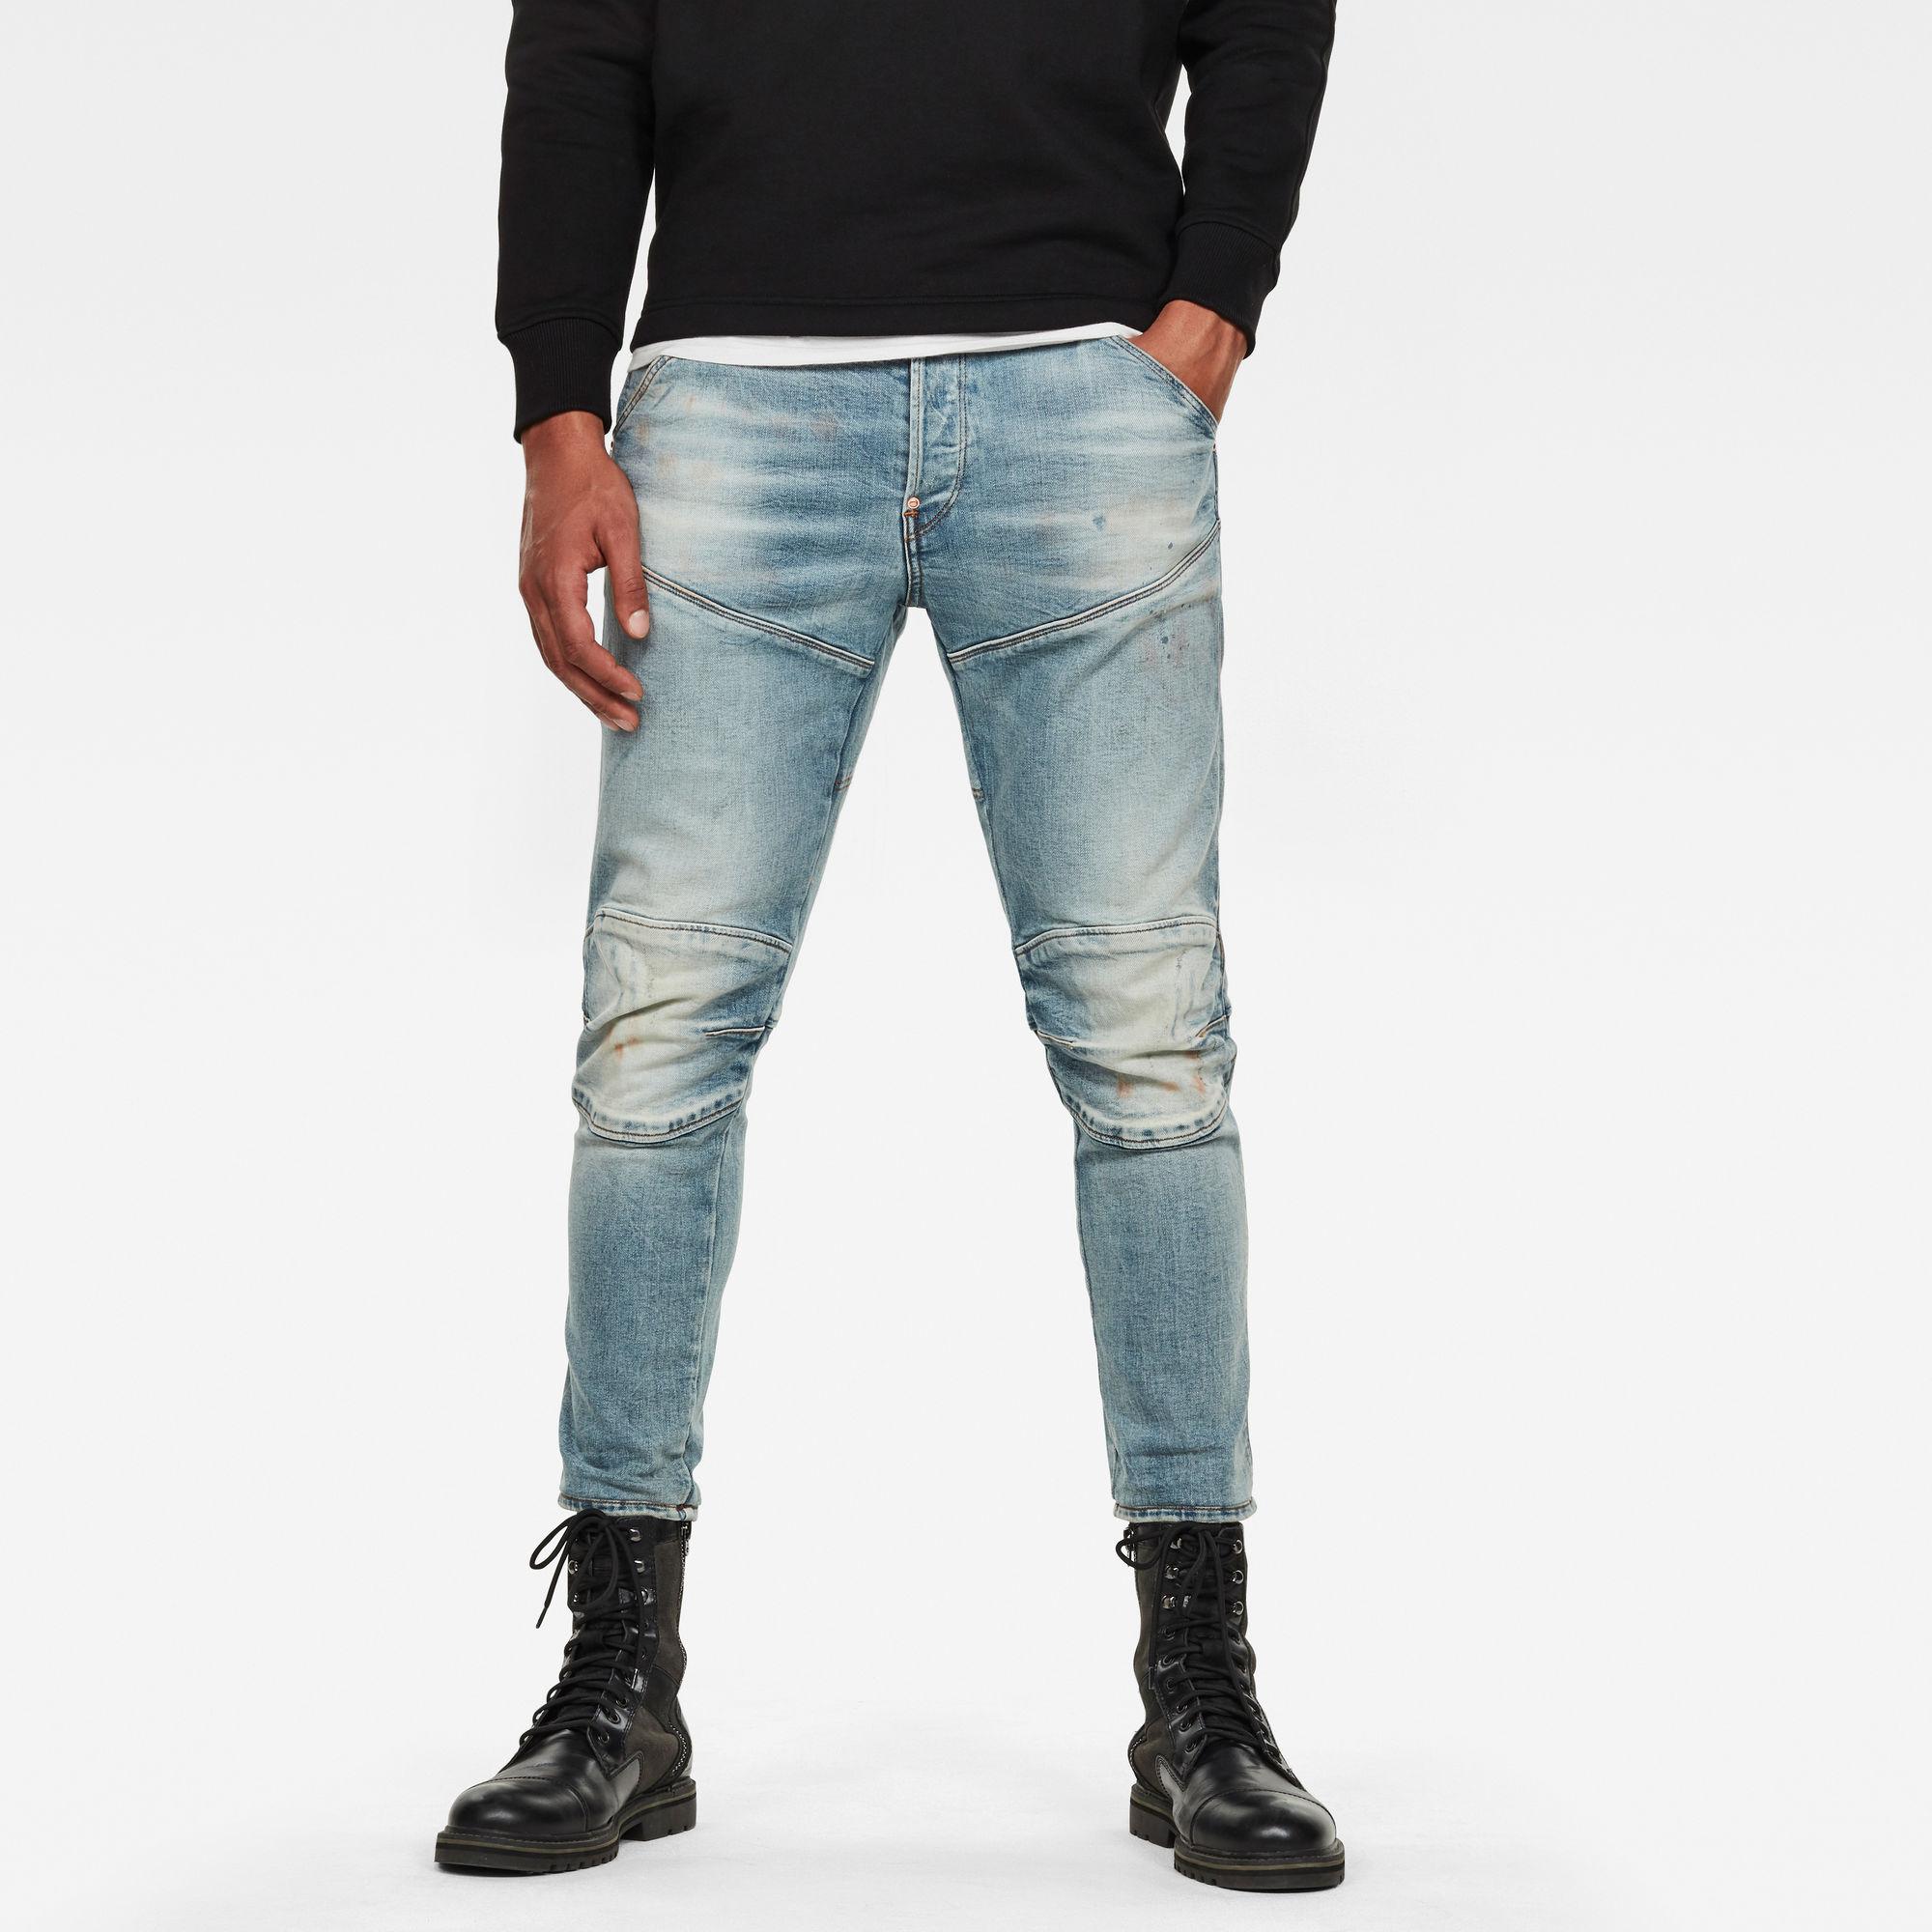 G-Star RAW Heren 5620 3D Slim Jeans Blauw